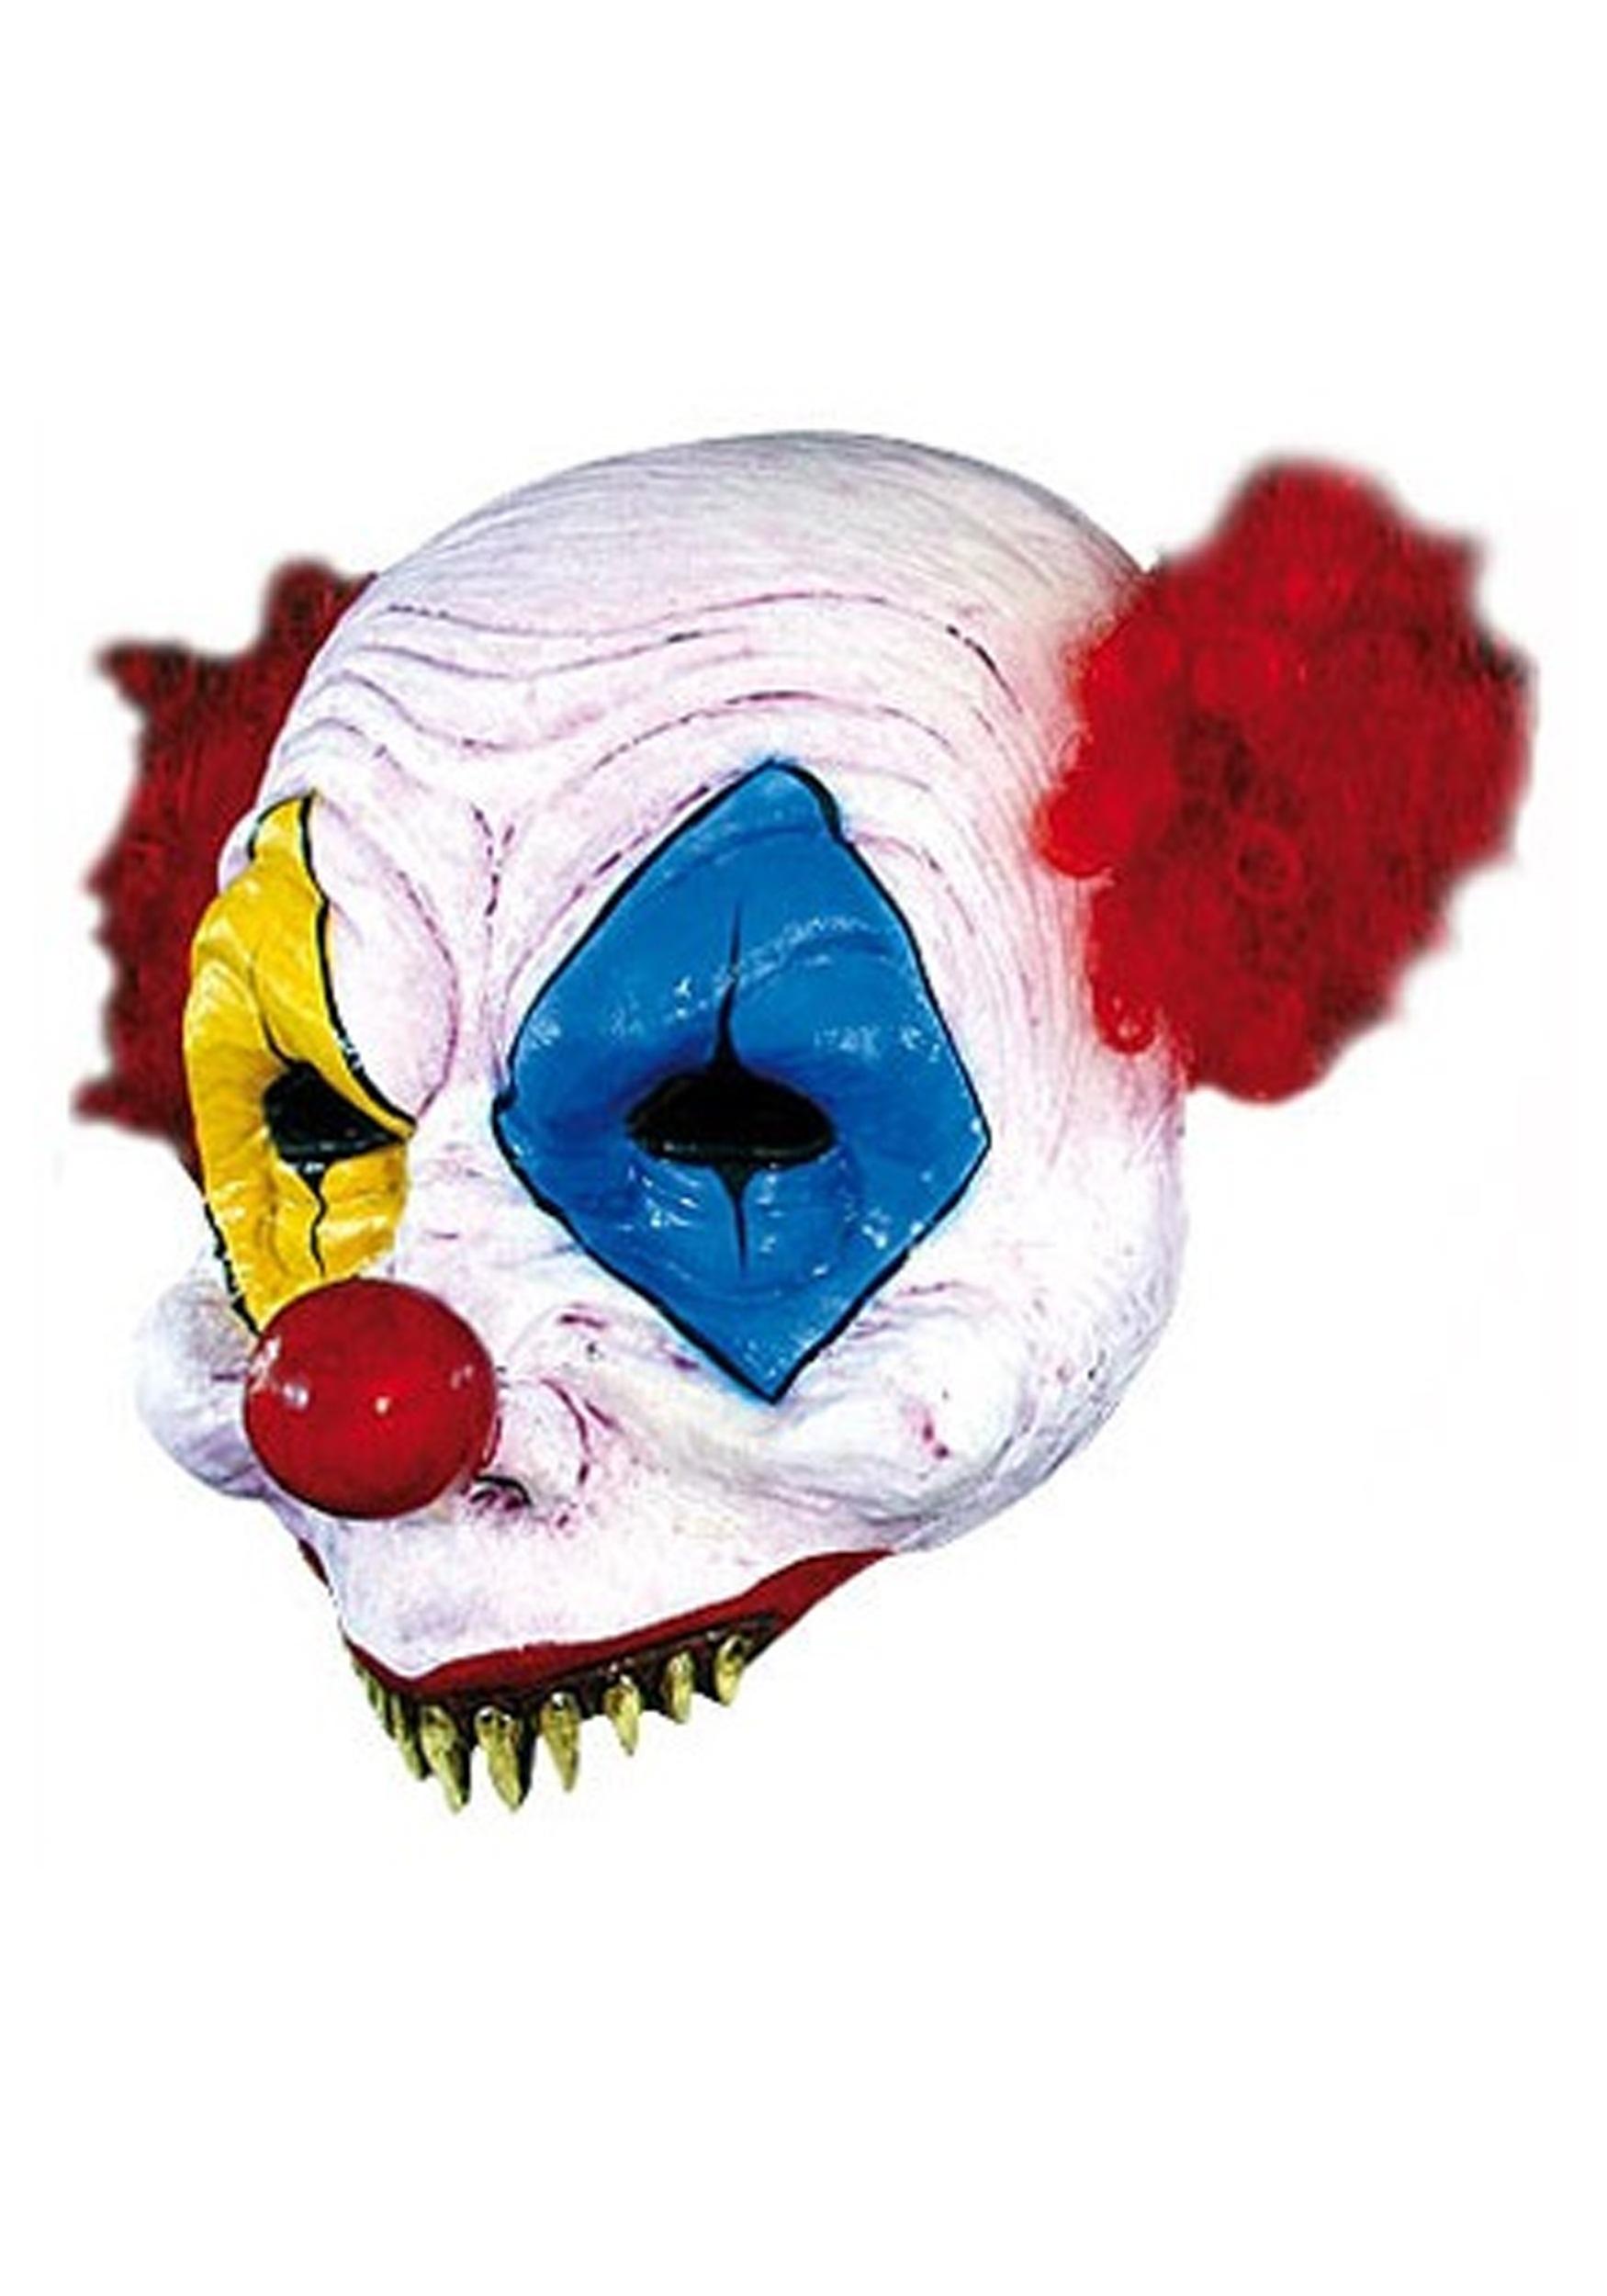 Scary Clown Half Mask GH26162